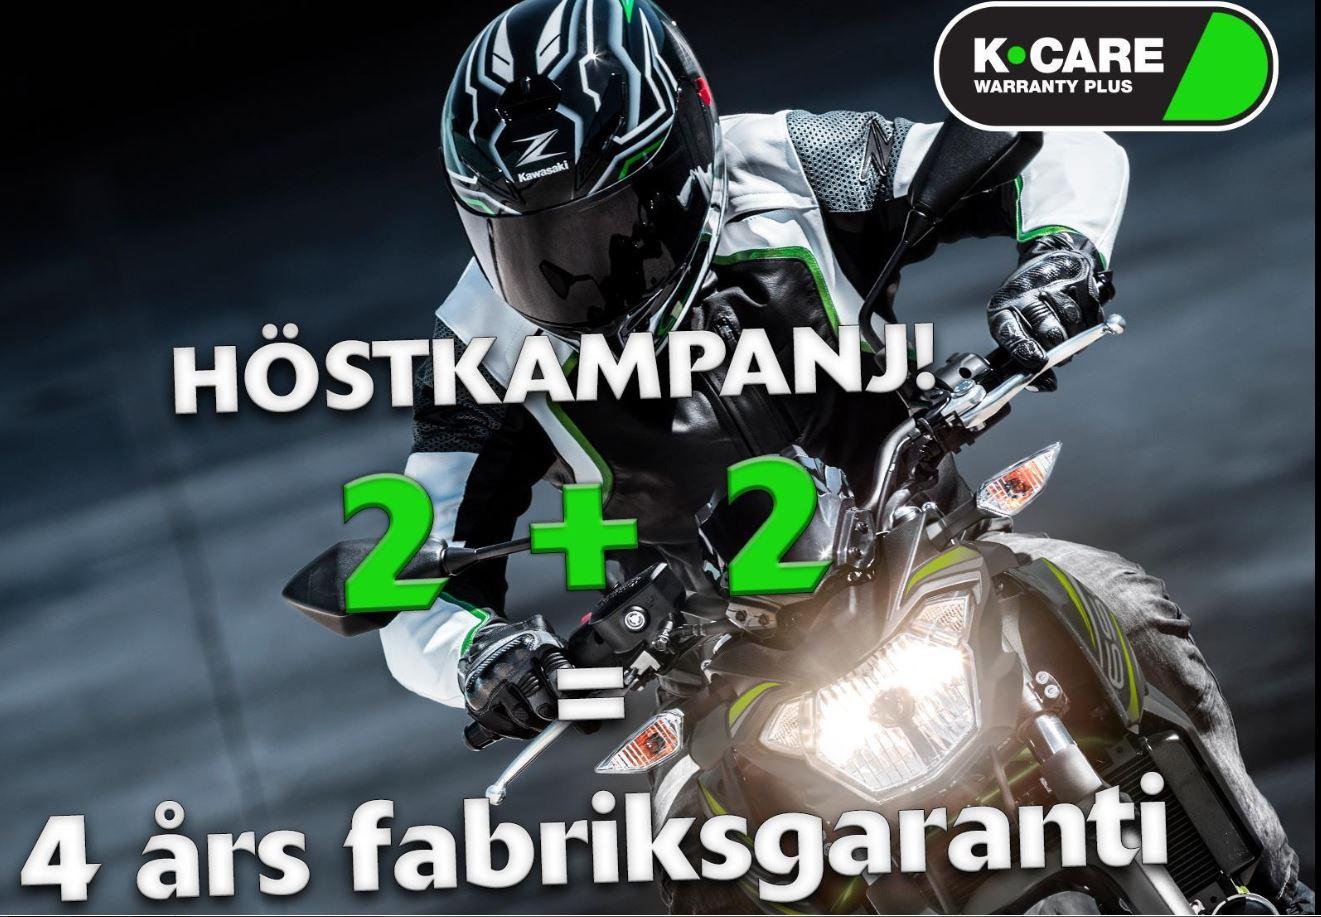 Höstkampanj! 4 års Kawasaki fabriksgaranti